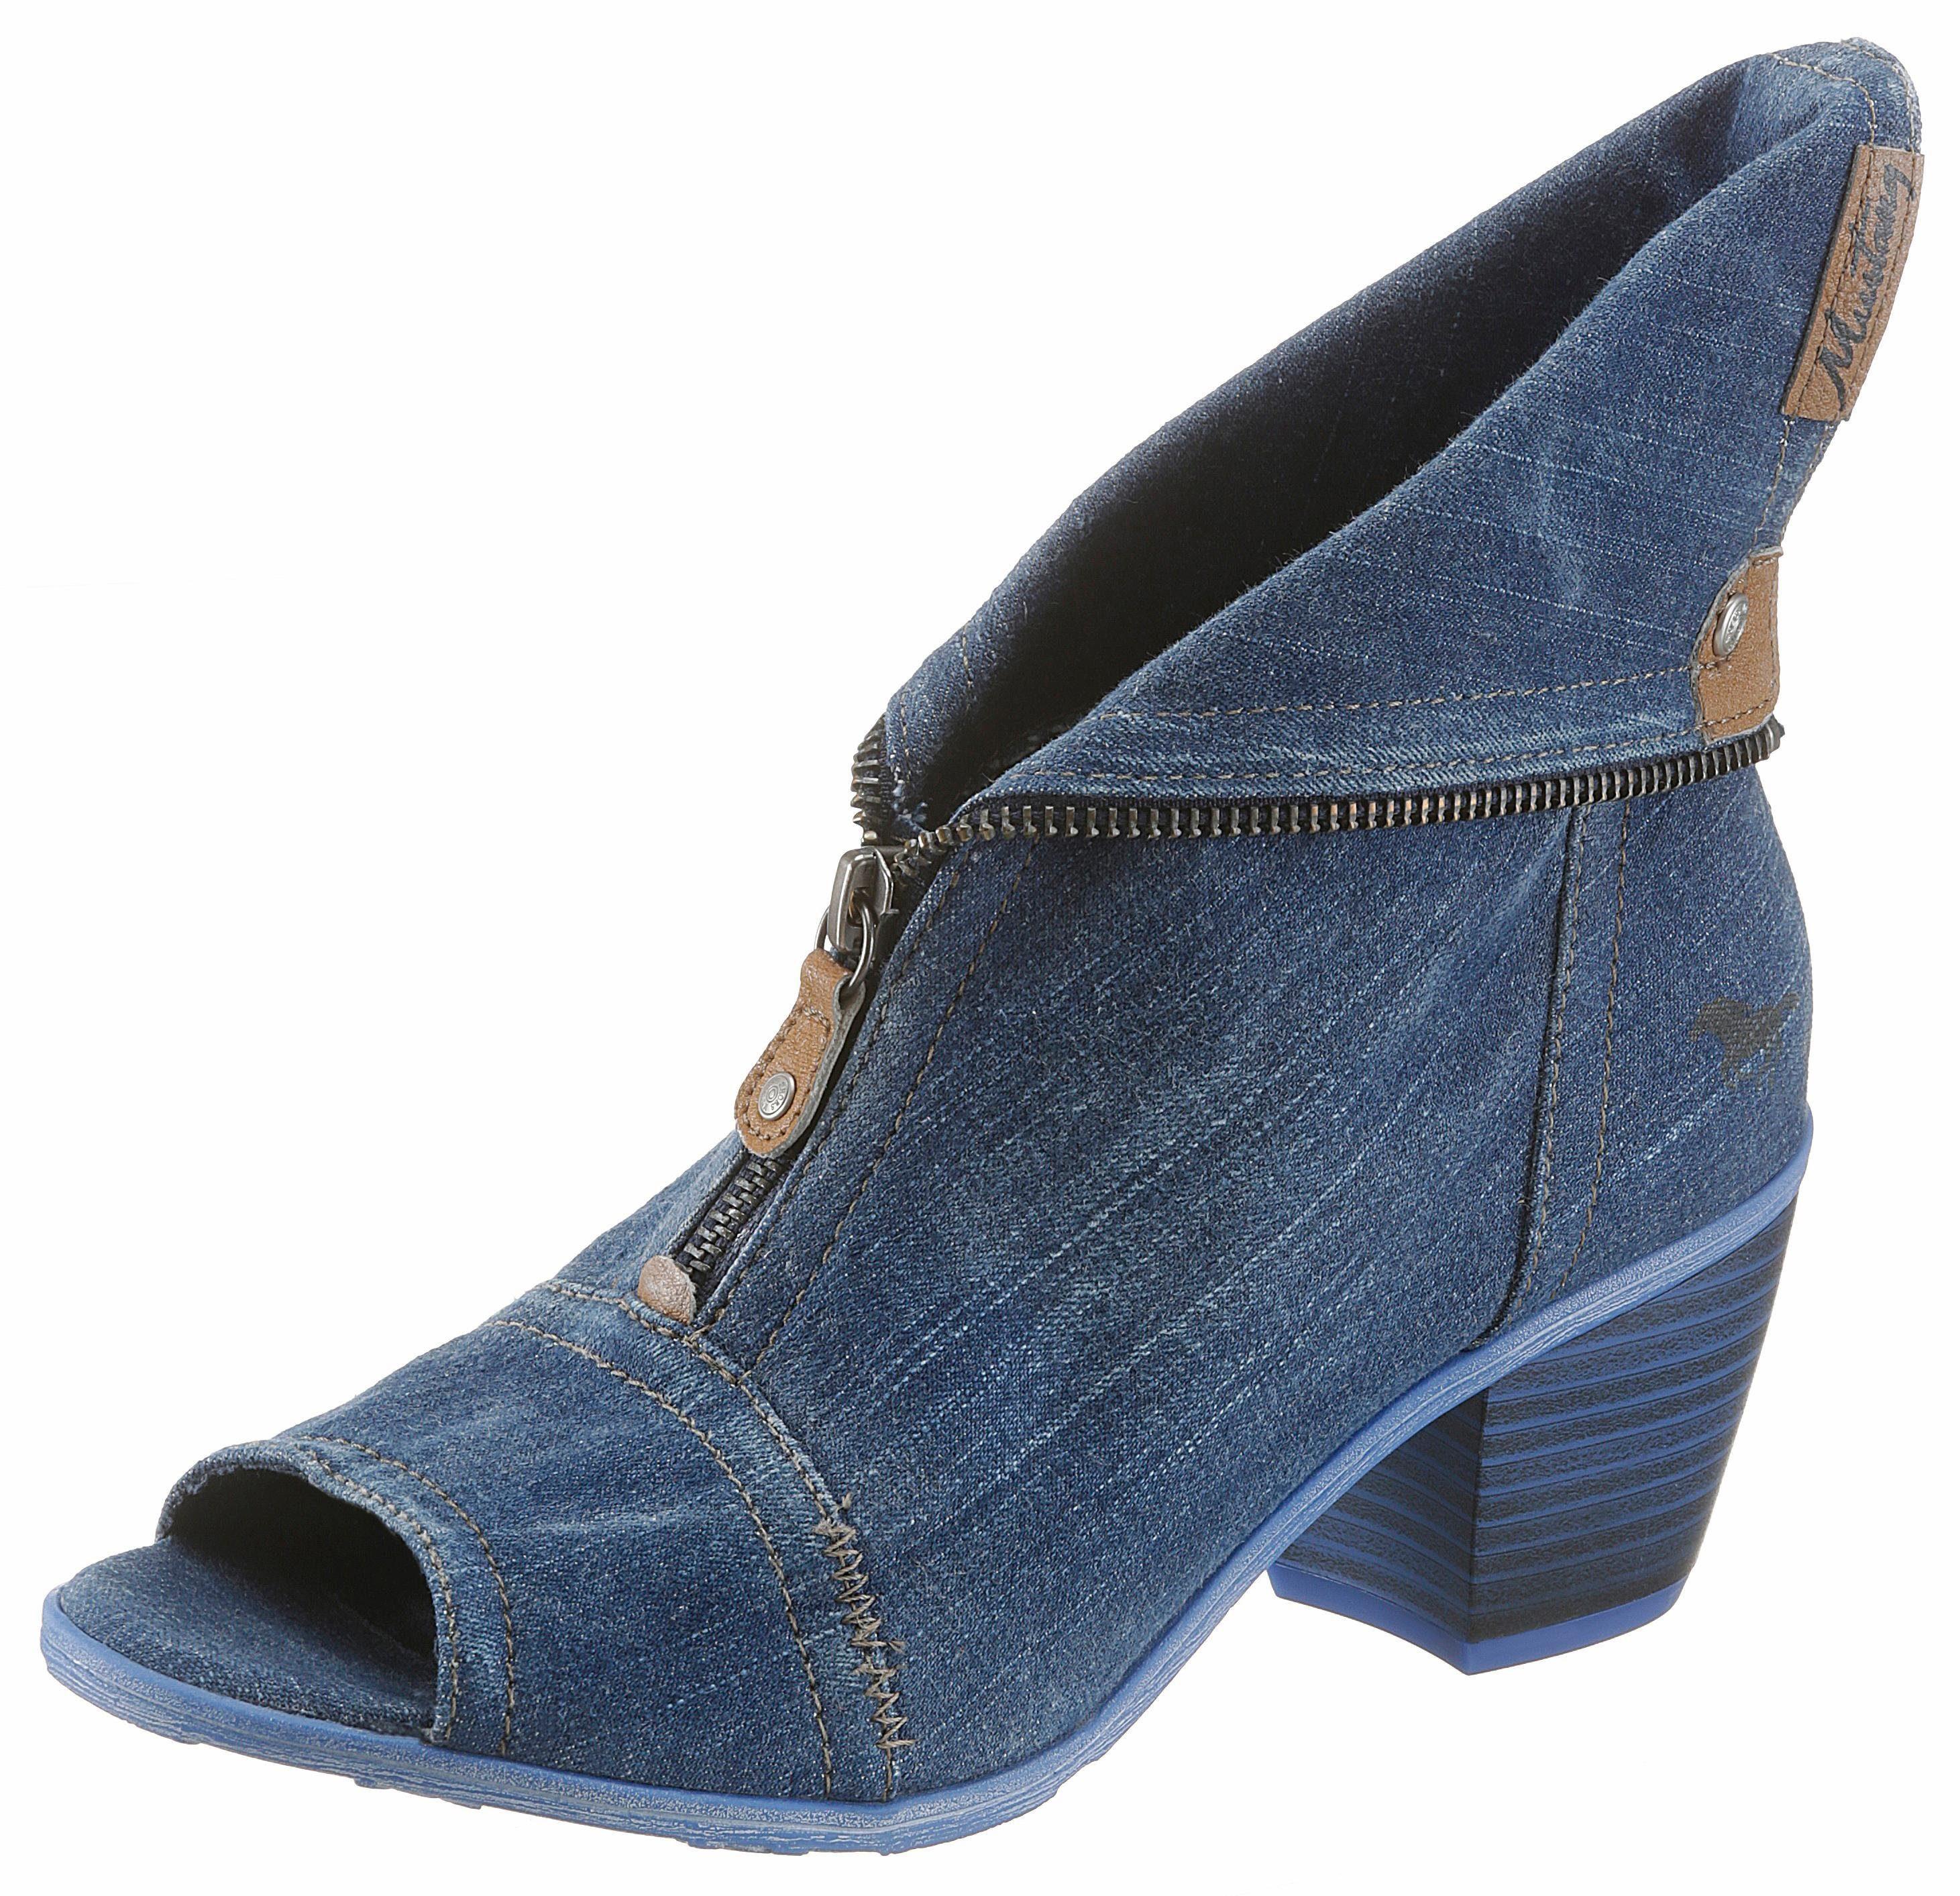 Mustang Shoes Sandalette, im Jeans Style, blau, jeansblau